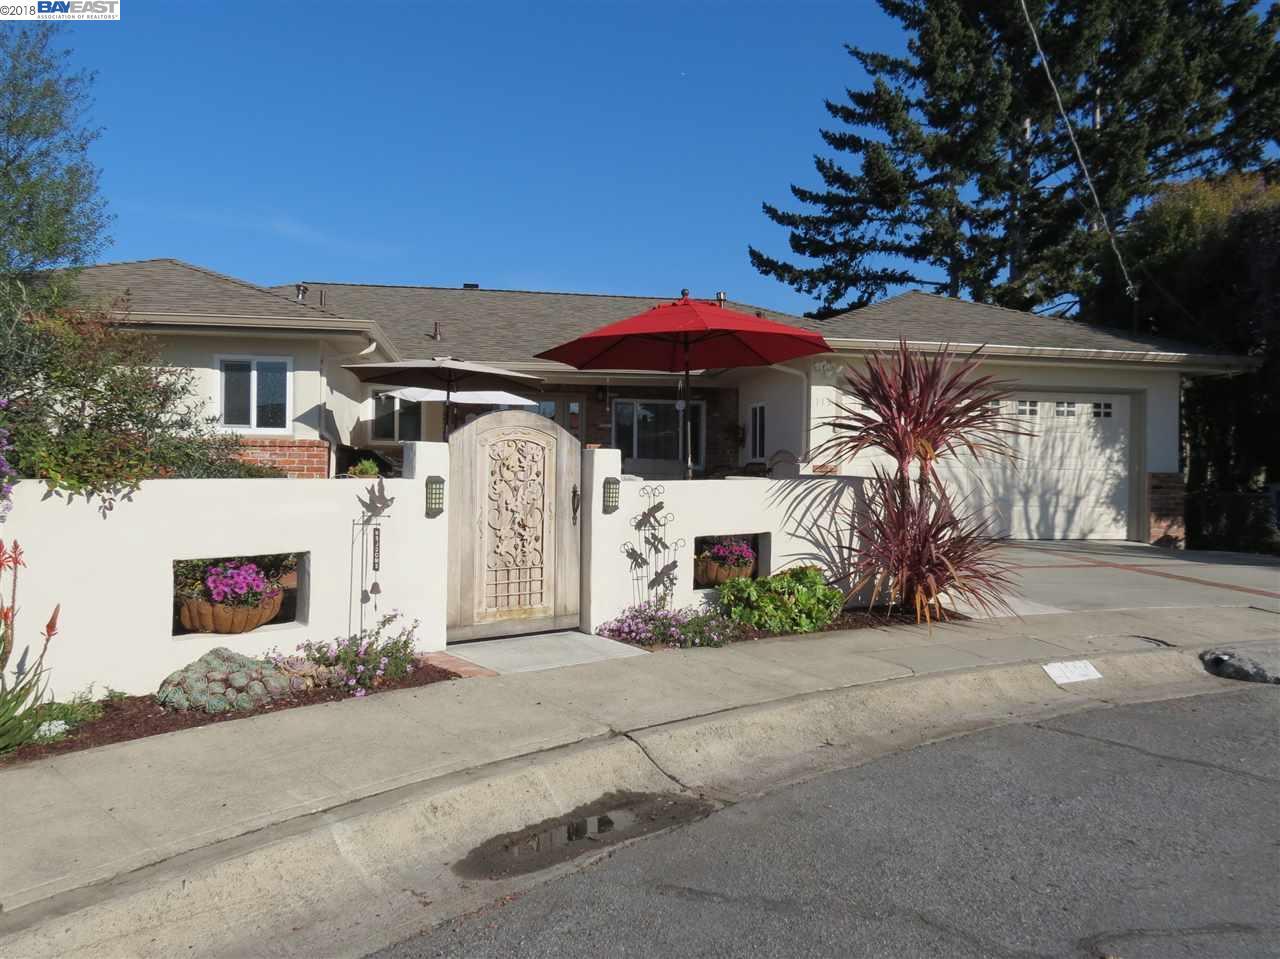 Single Family Home for Sale at 113 Rantoul Circle 113 Rantoul Circle San Leandro, California 94577 United States